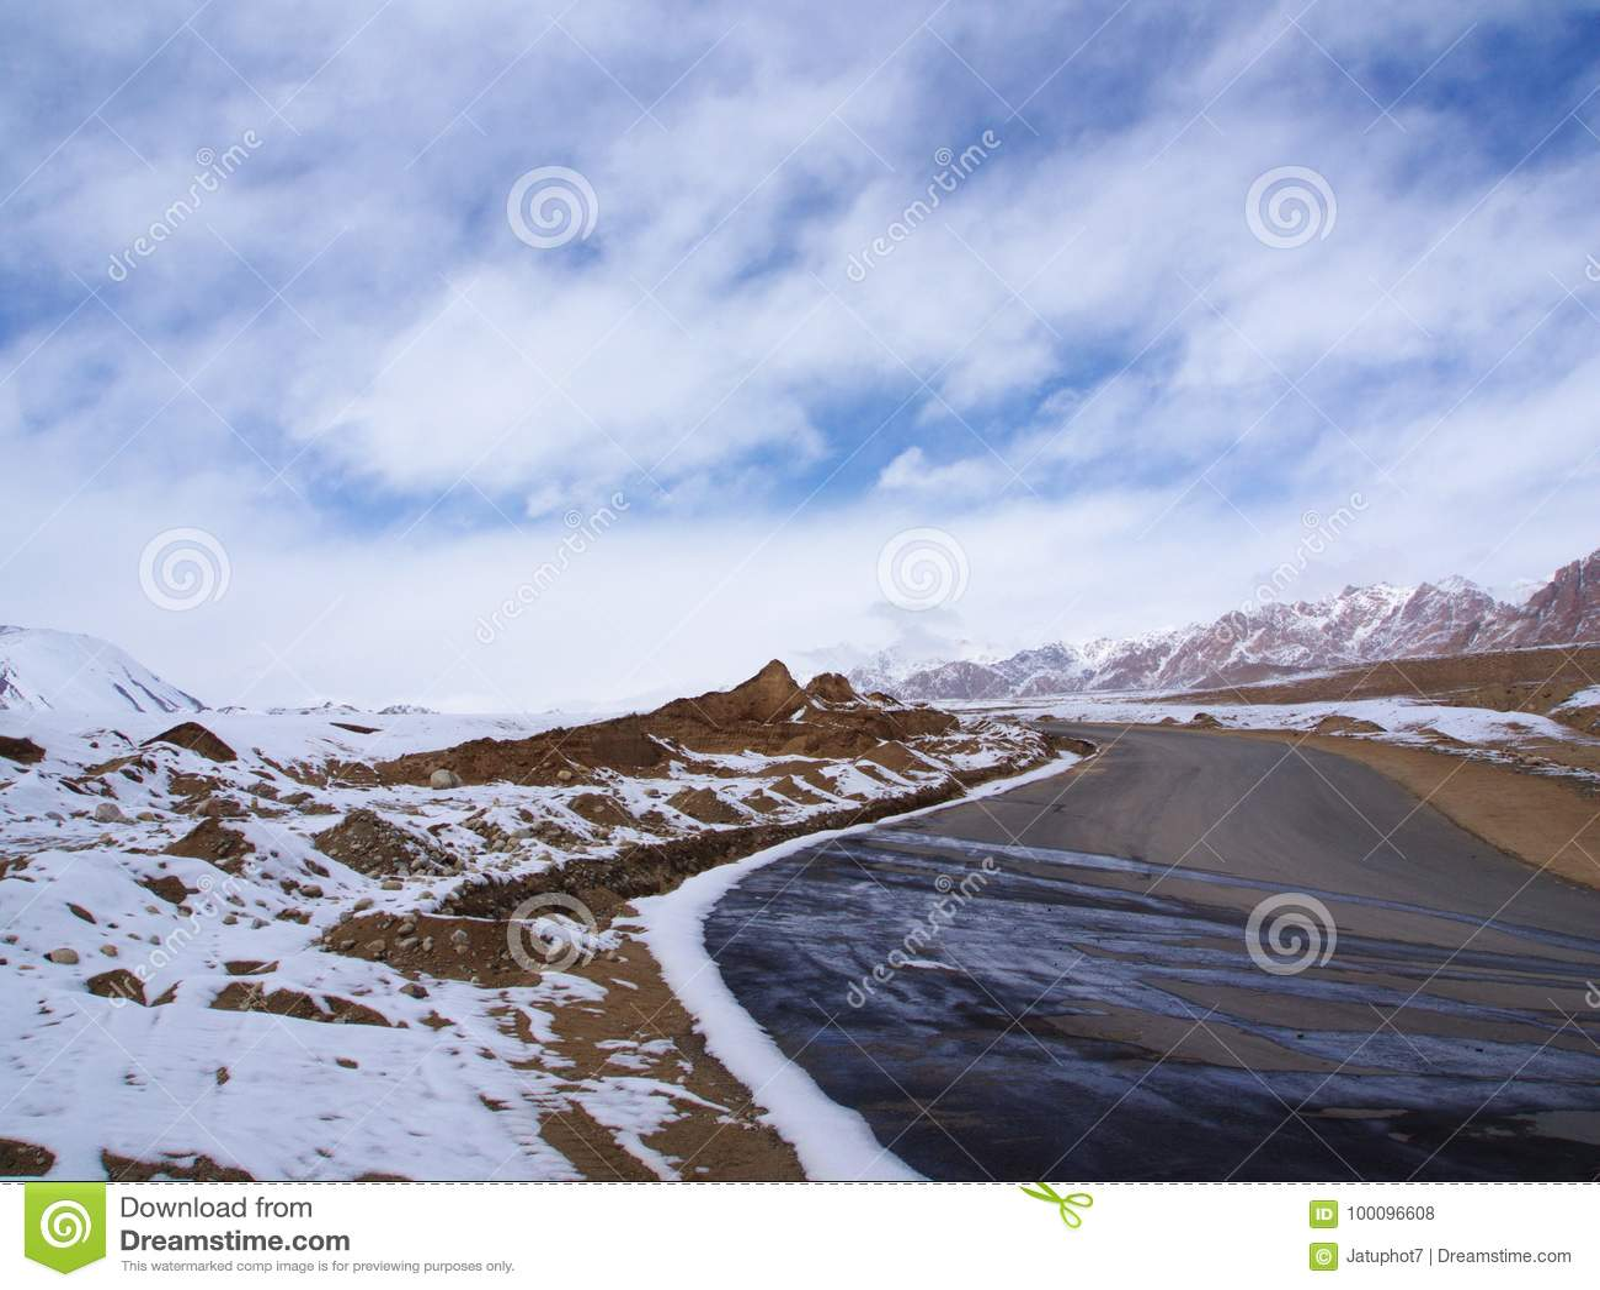 Snow Mountain Road from Leh to Manali, Tibetan Himalaya Road